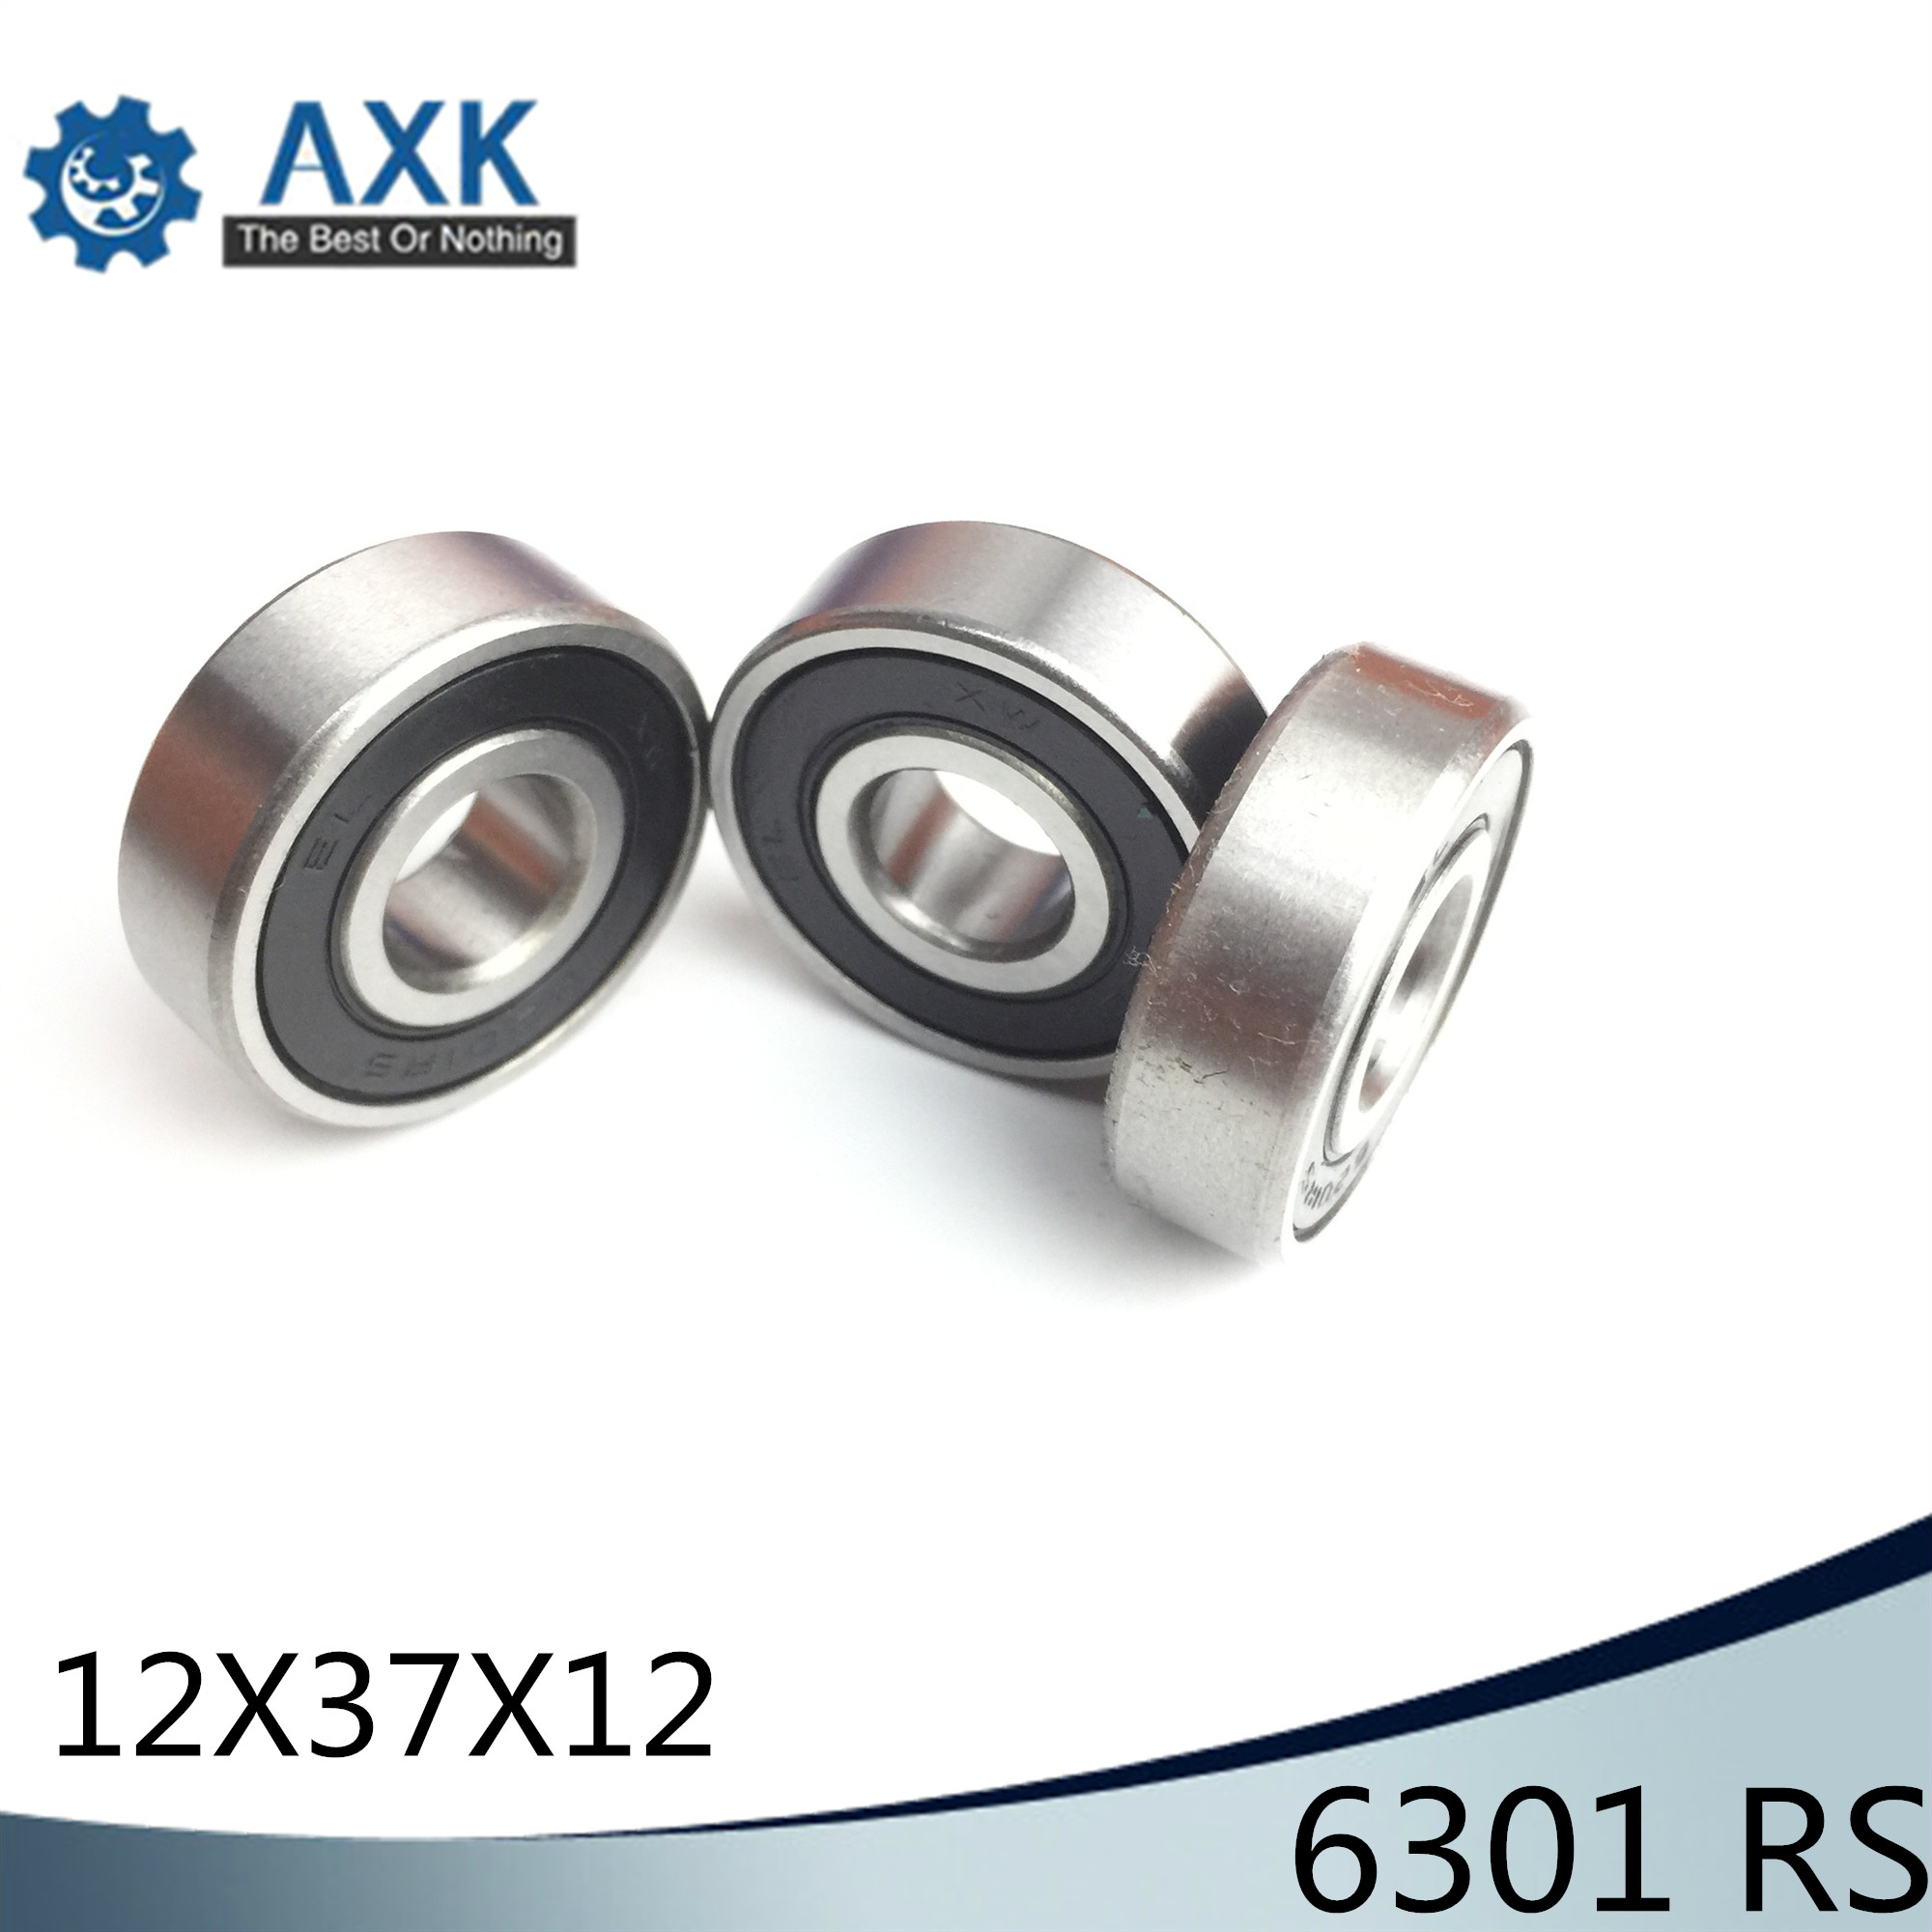 1PC 153712 Non-Standard Ball Bearings 15*37*12 mm